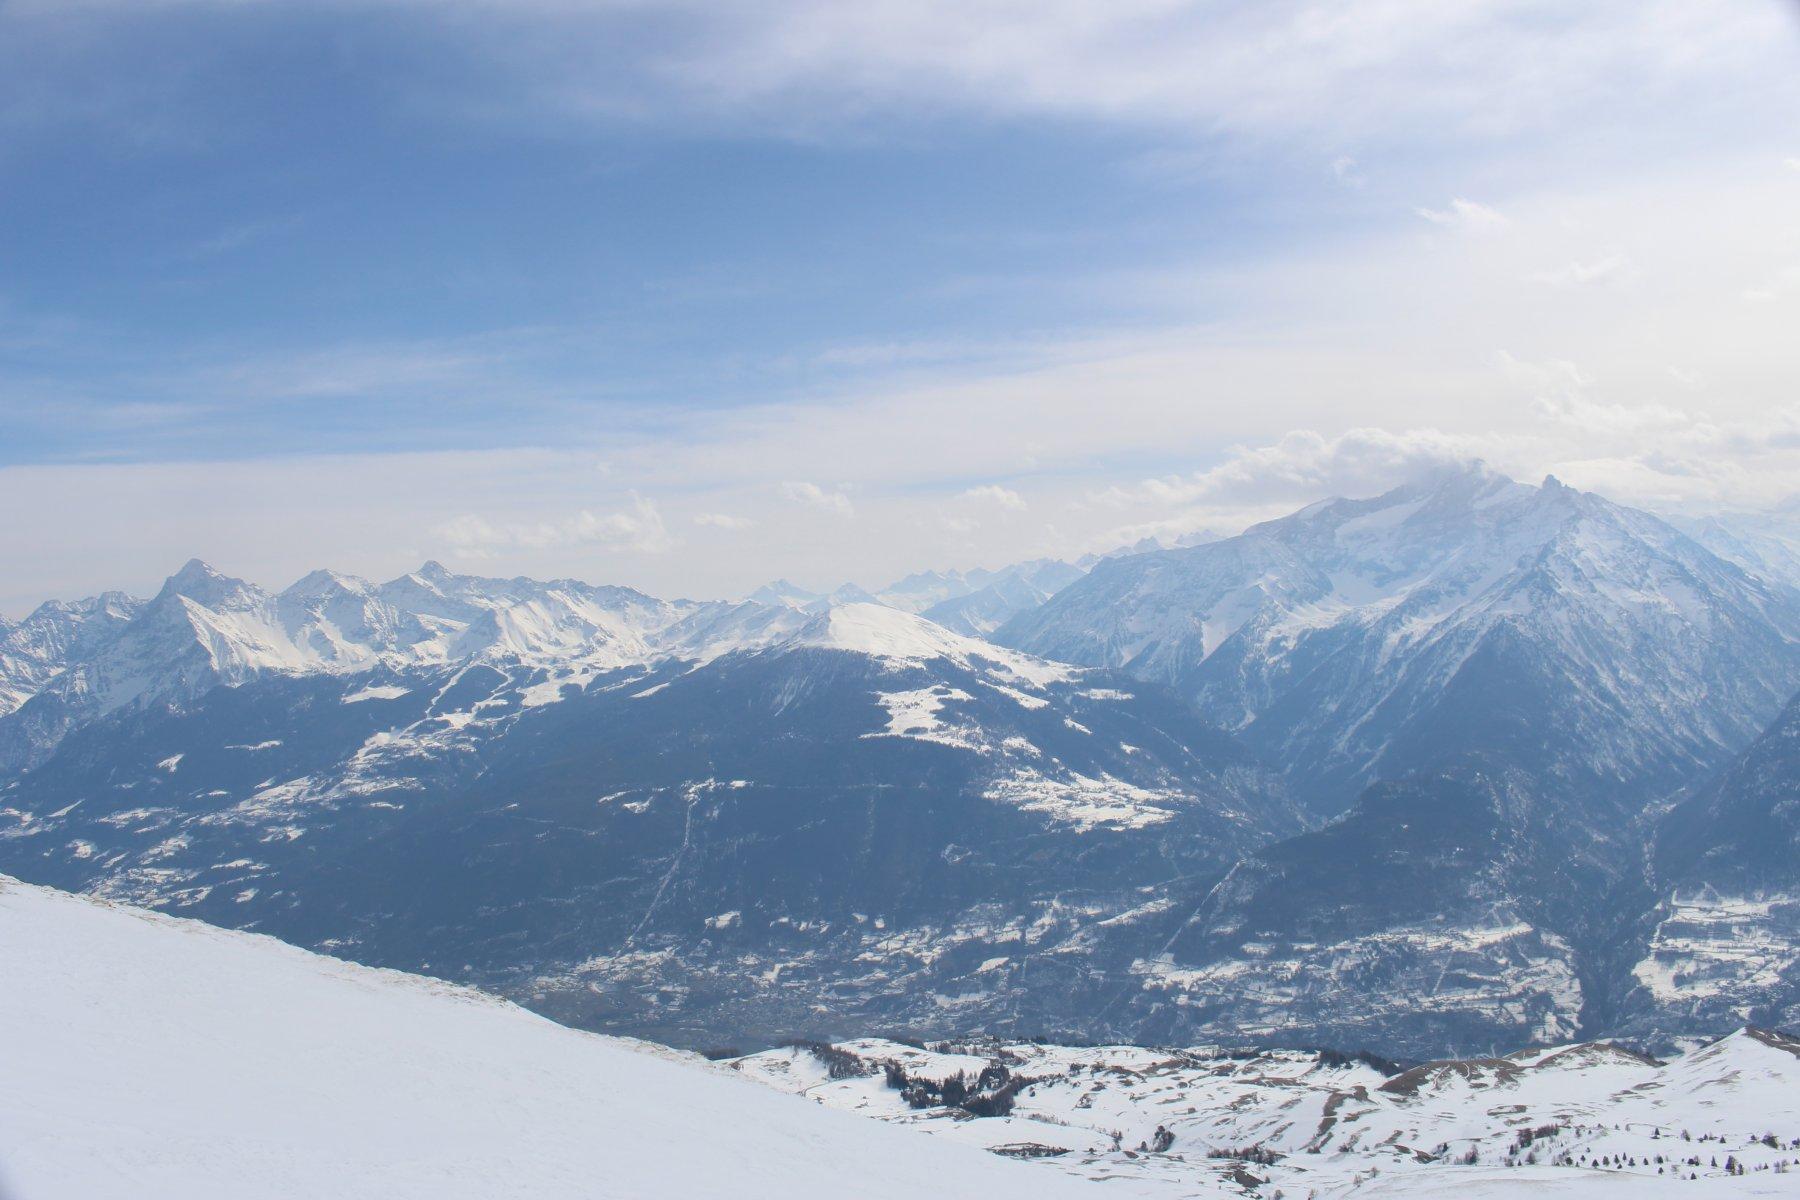 panorama su conca di Aosta, Grivola, Pointe de la Pierre, Emilius, Tersiva